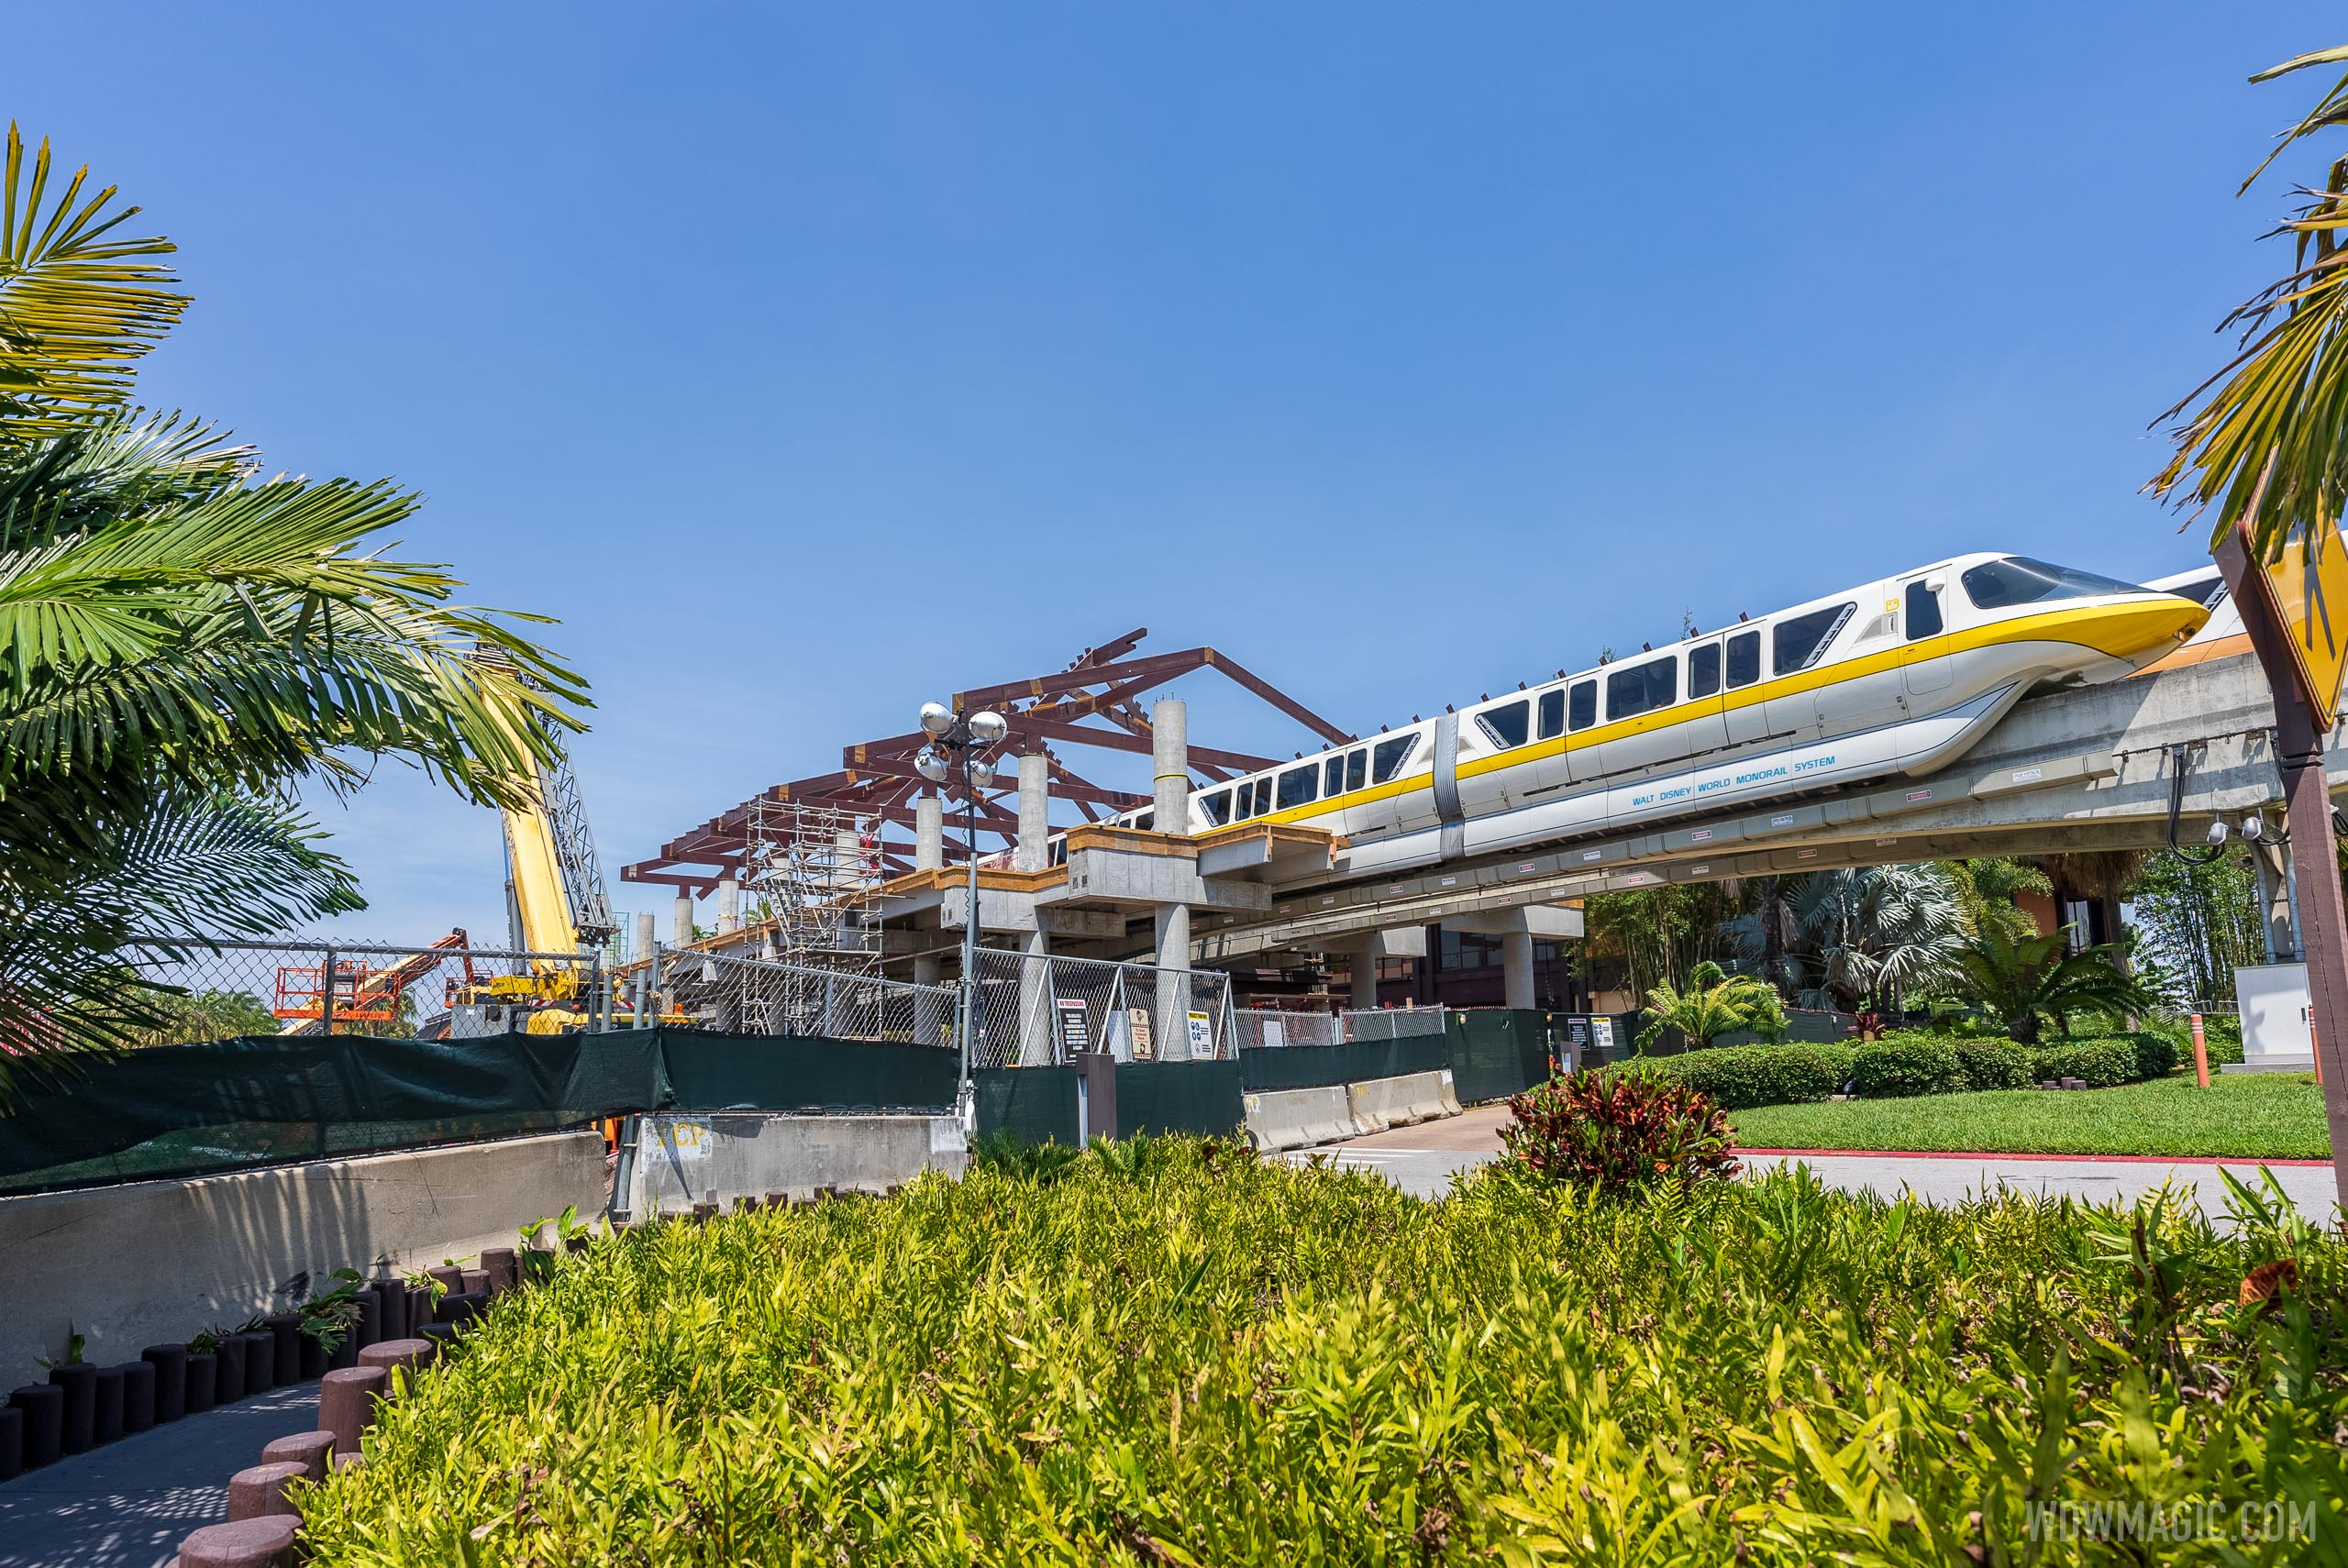 Polynesian Village Resort monorail station construction - April 16 2021